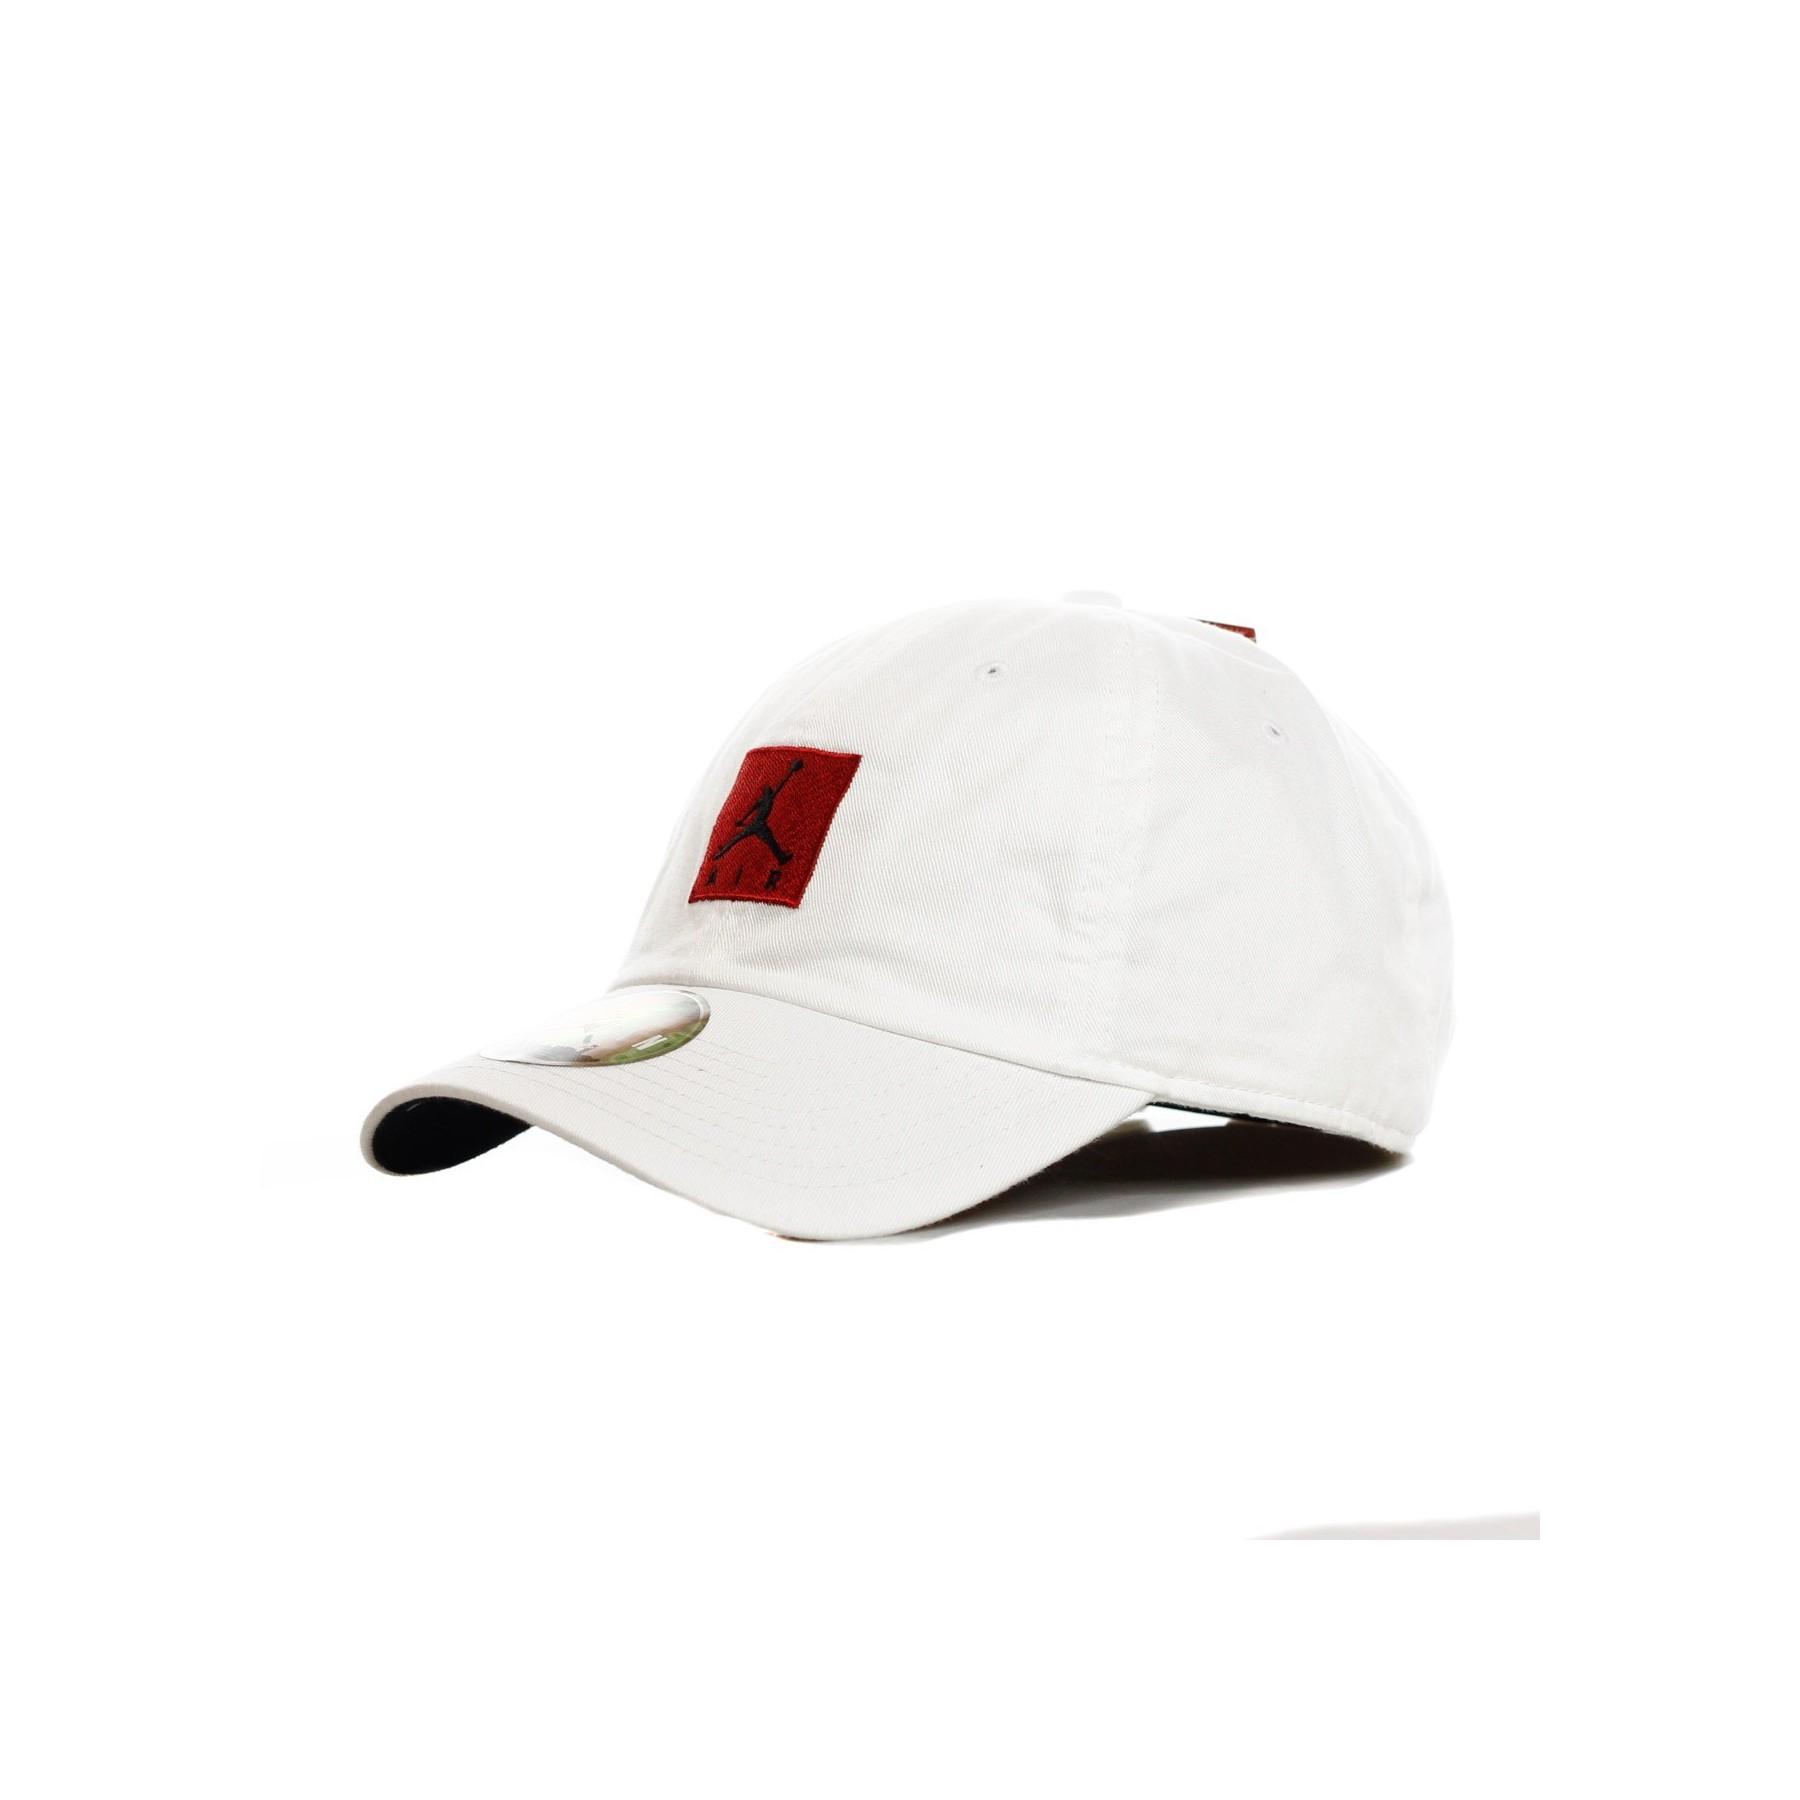 CAPPELLO VISIERA CURVA JORDAN H86 JUMPMAN AIR WHITE BLACK GYM RED ... f927aace5db1